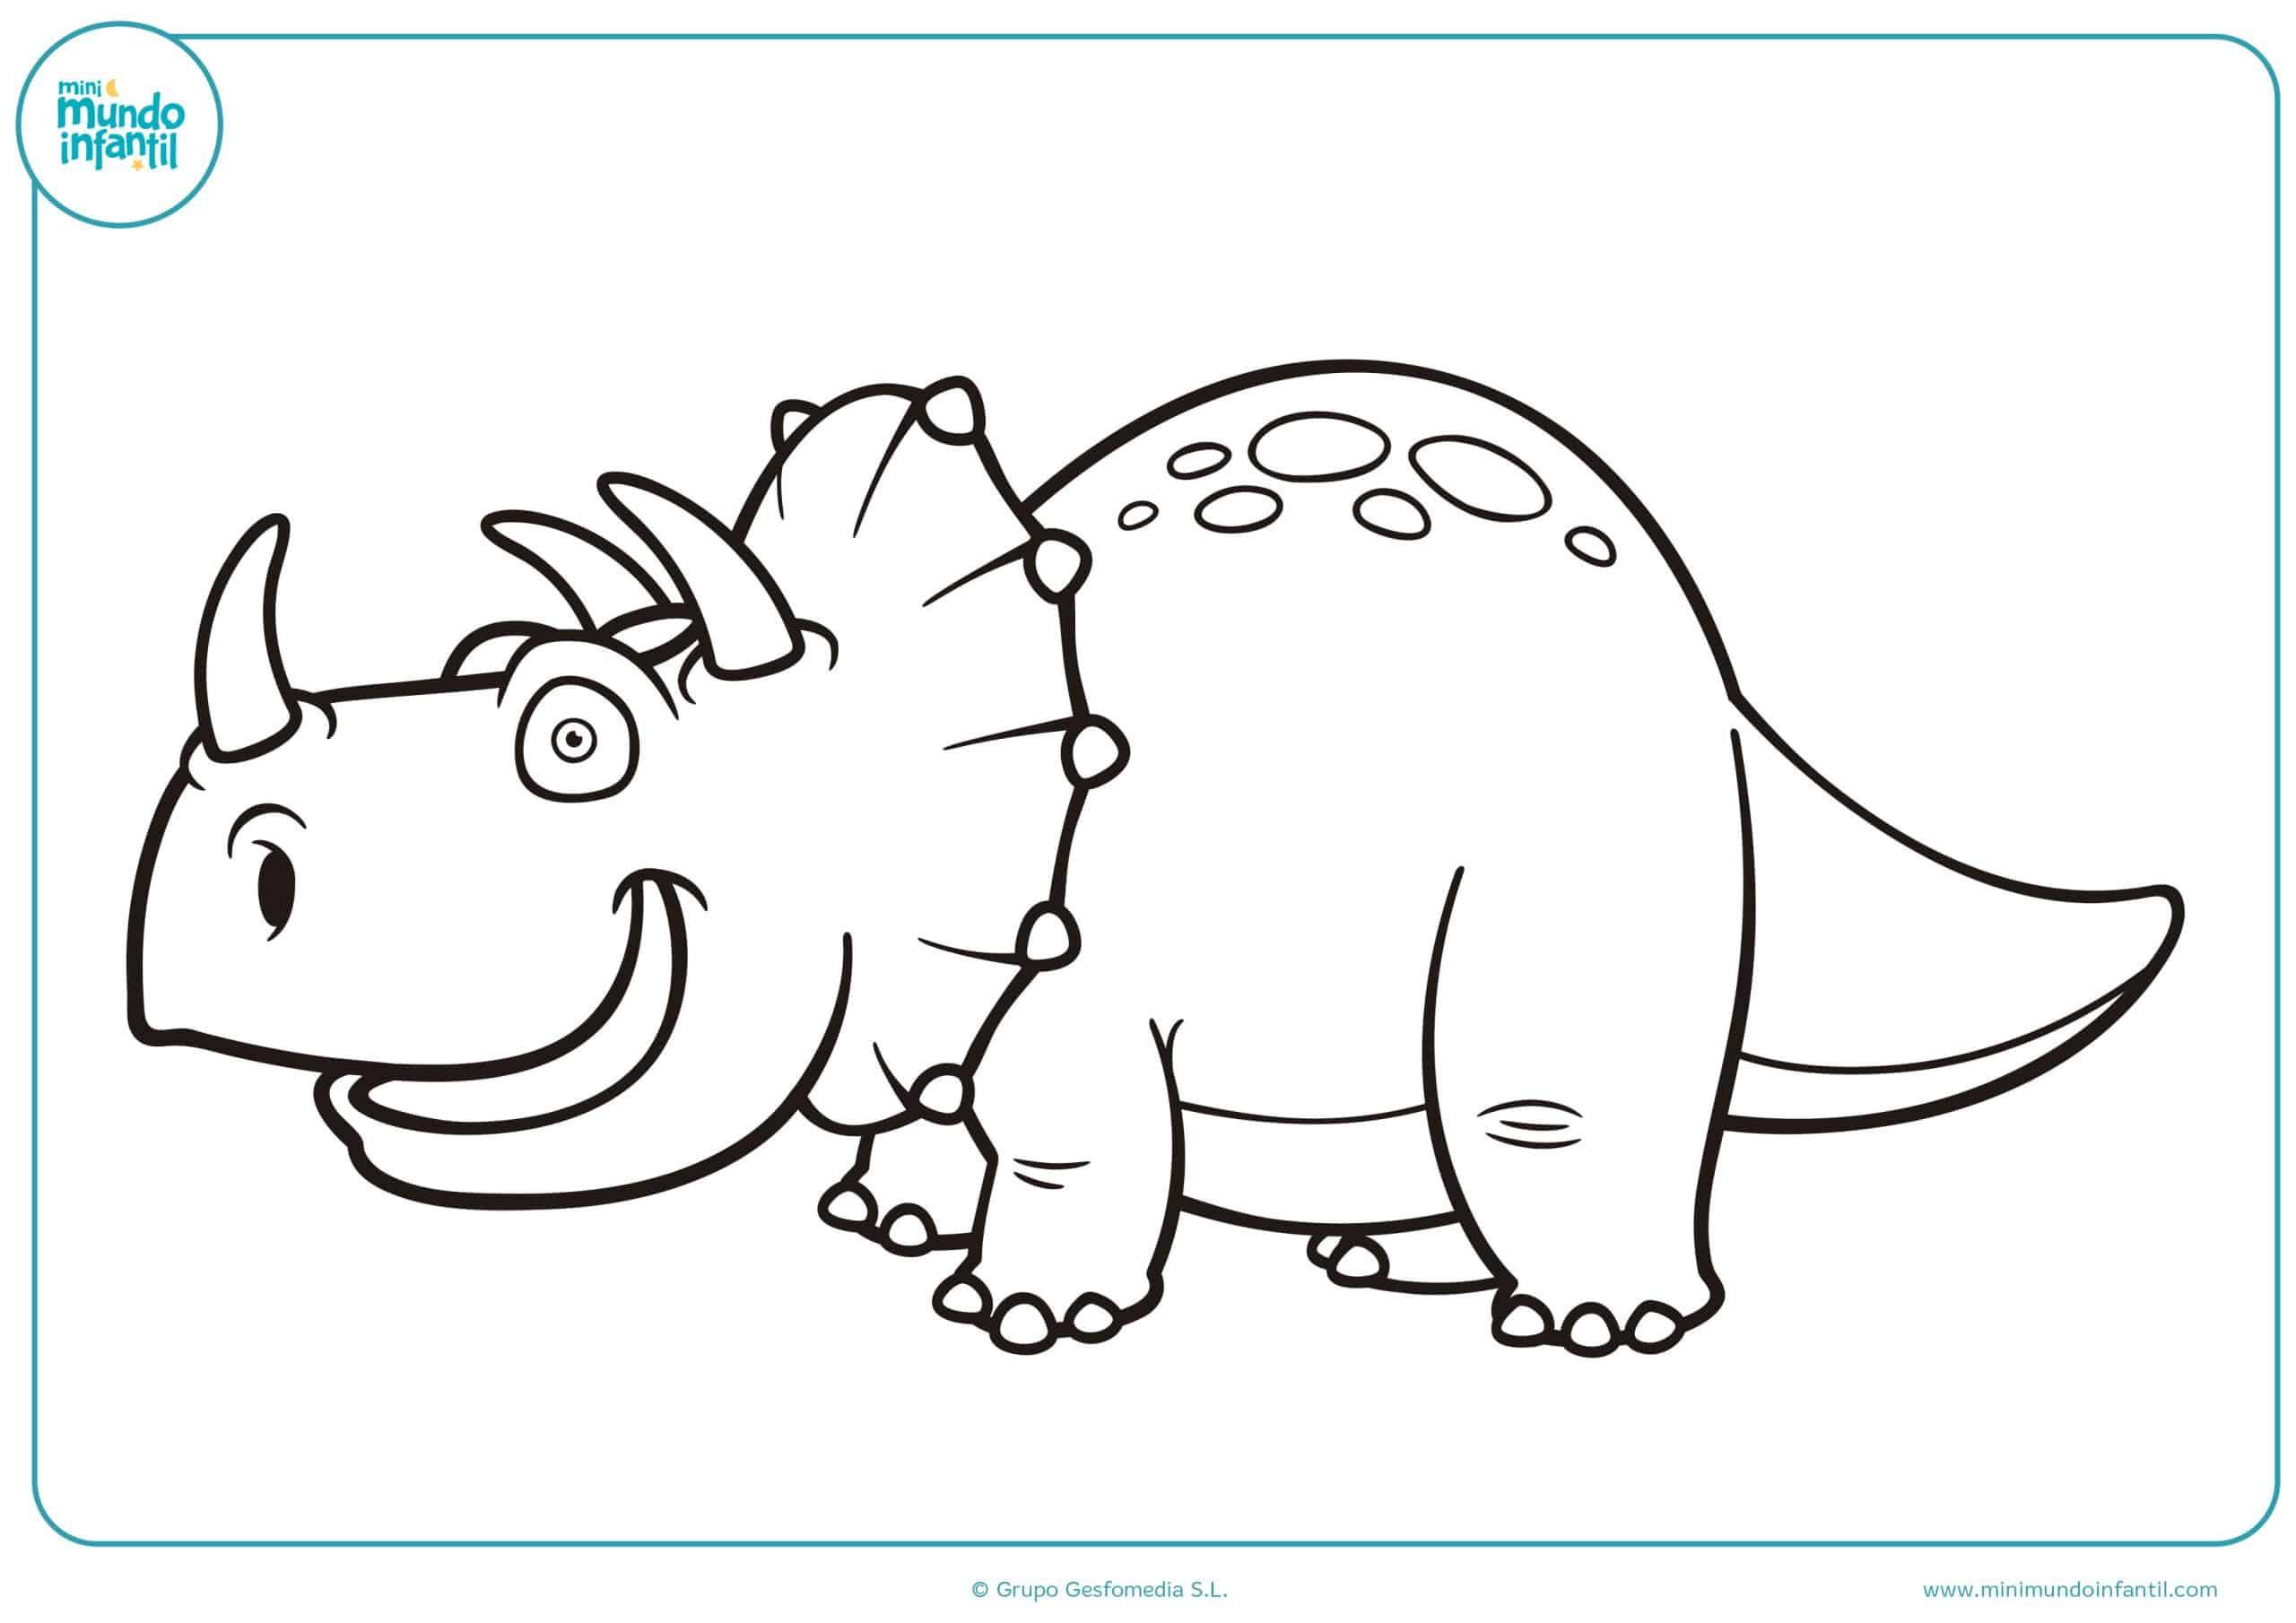 Colorear dibujos dinosauros